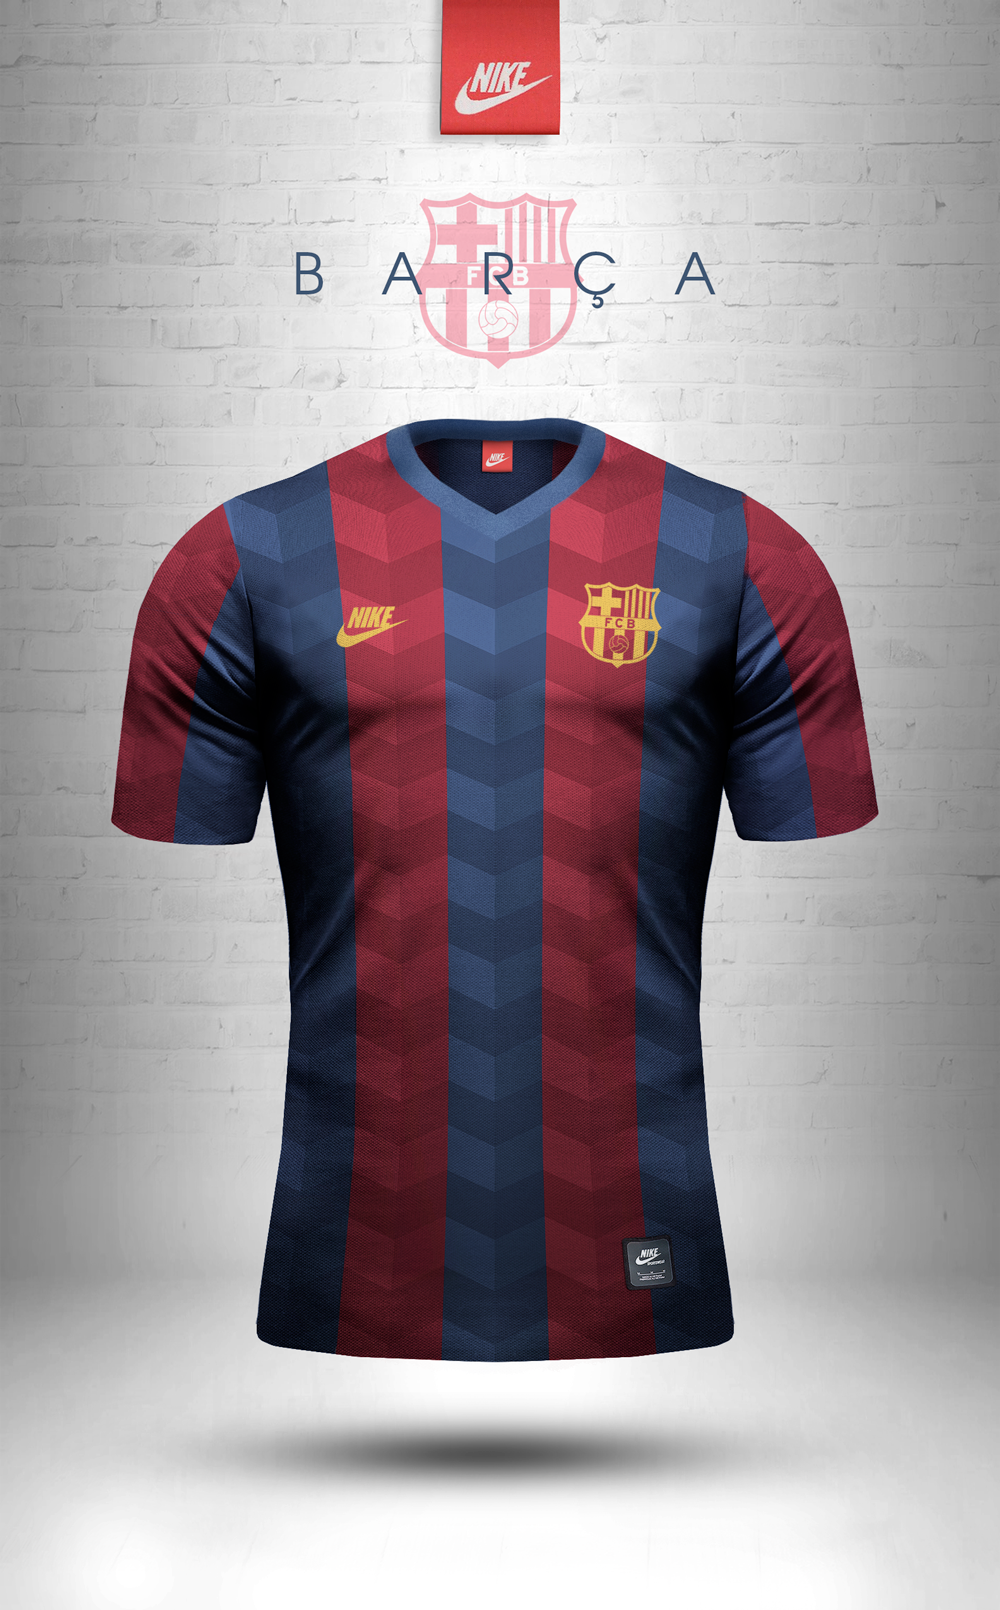 345b74f4b1 Barça Jersey. … | Gráficos | Footb…